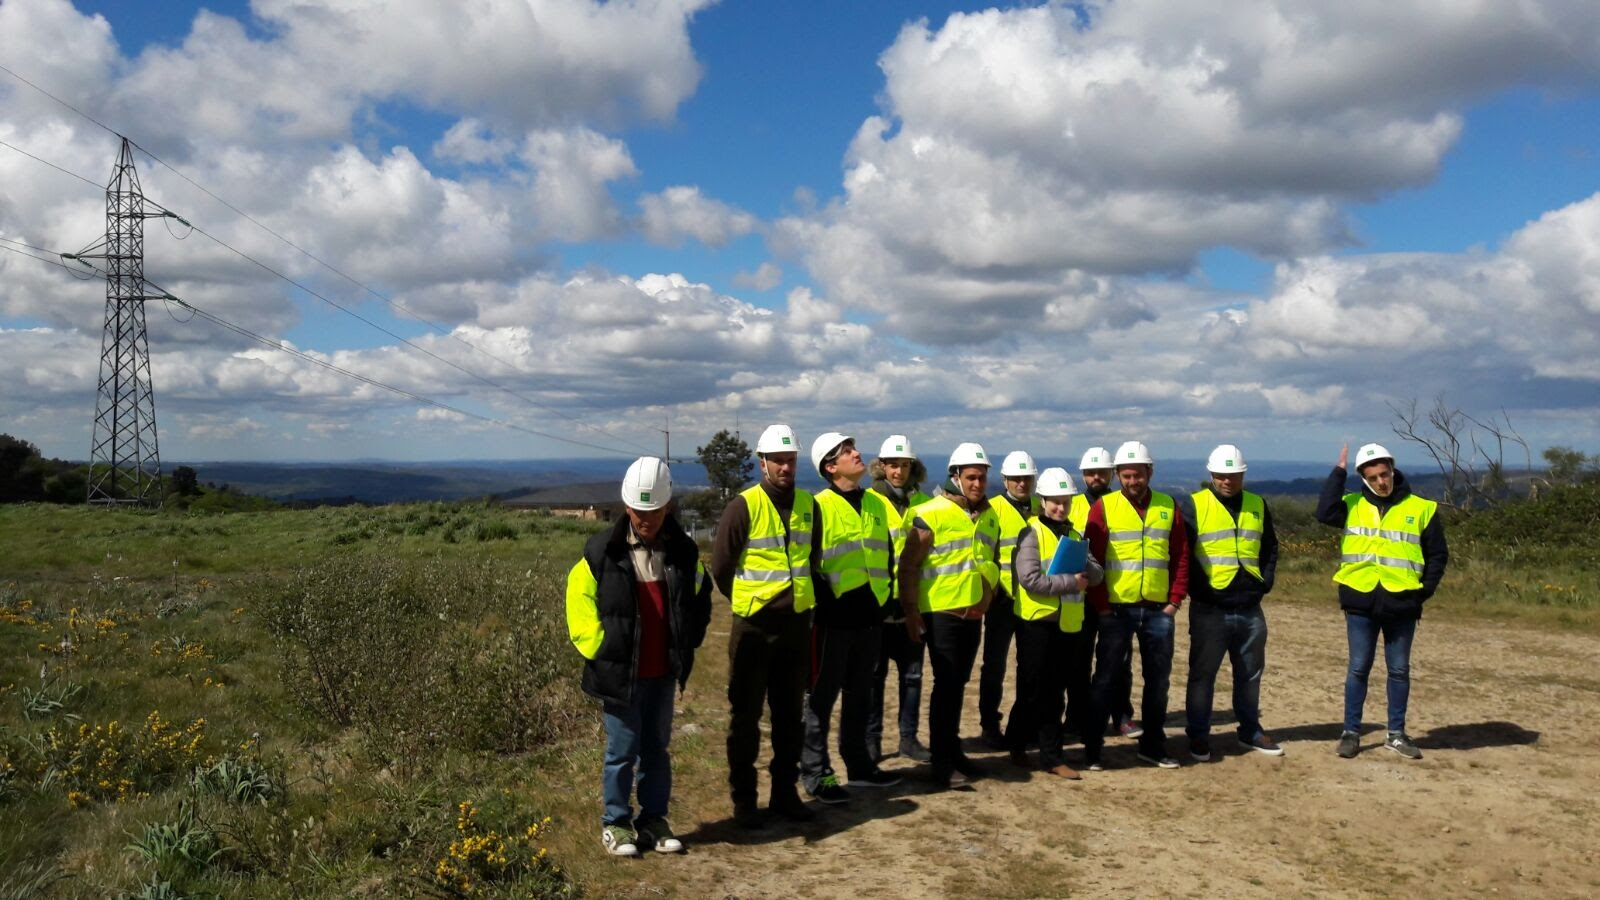 Visita al Parque eólico Touriñán- MasterD Vigo